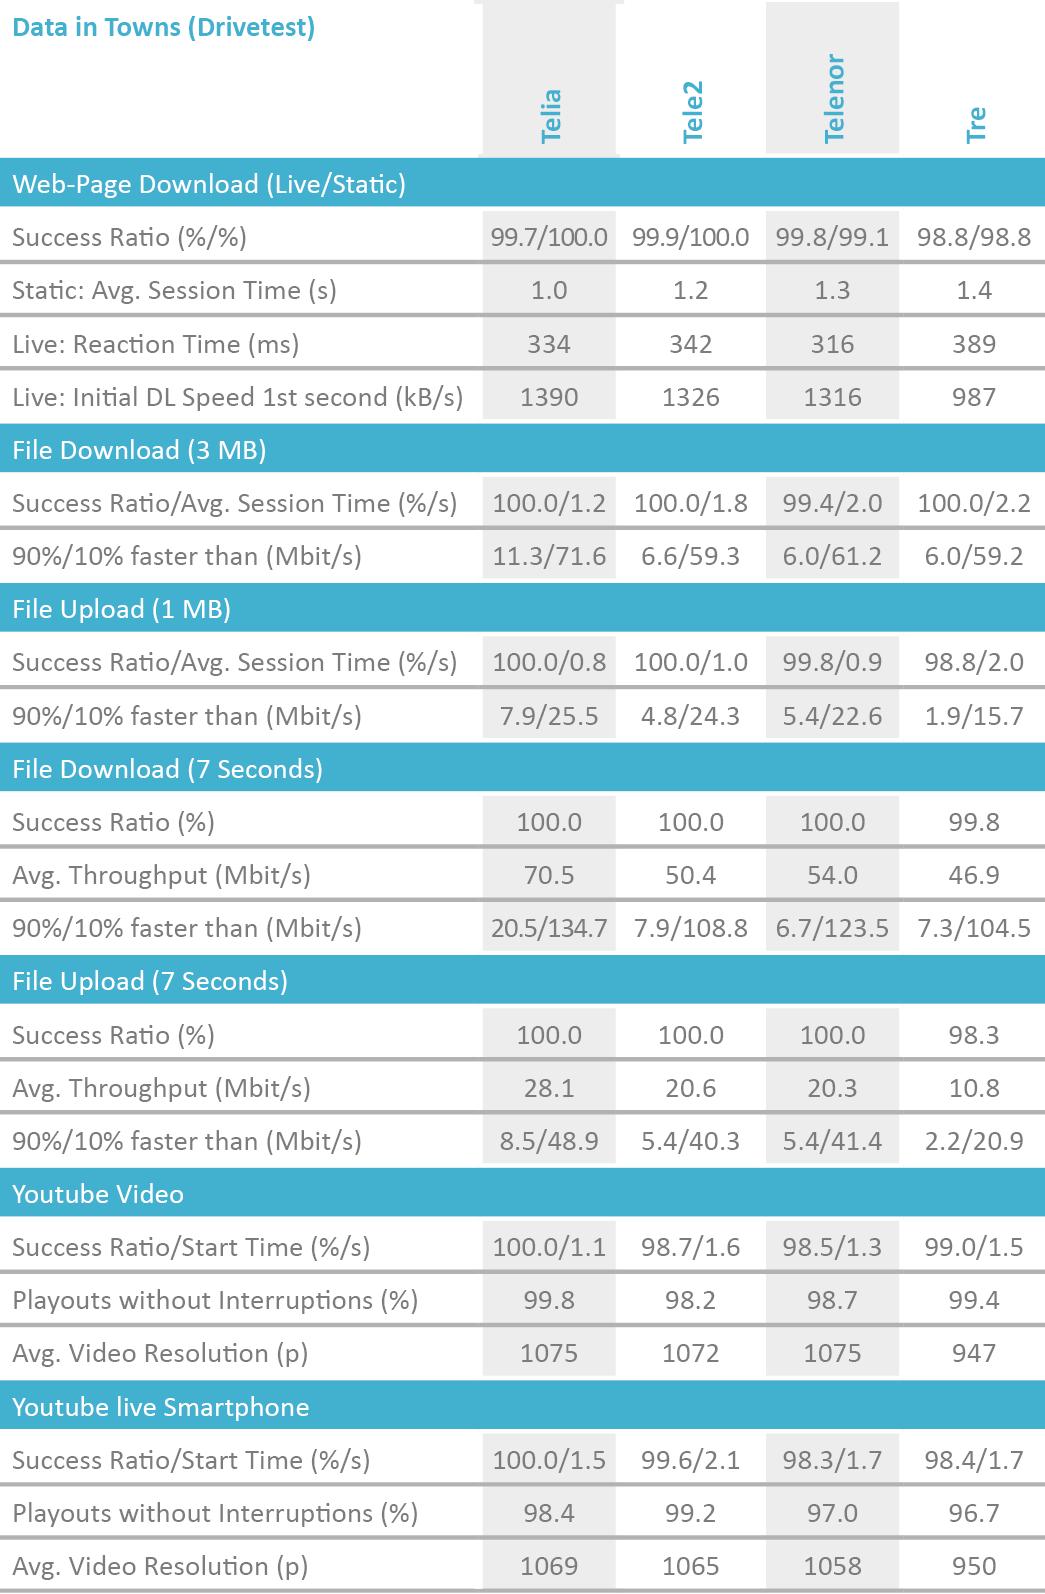 SE2019_table_DataTowns_Drivetest.png